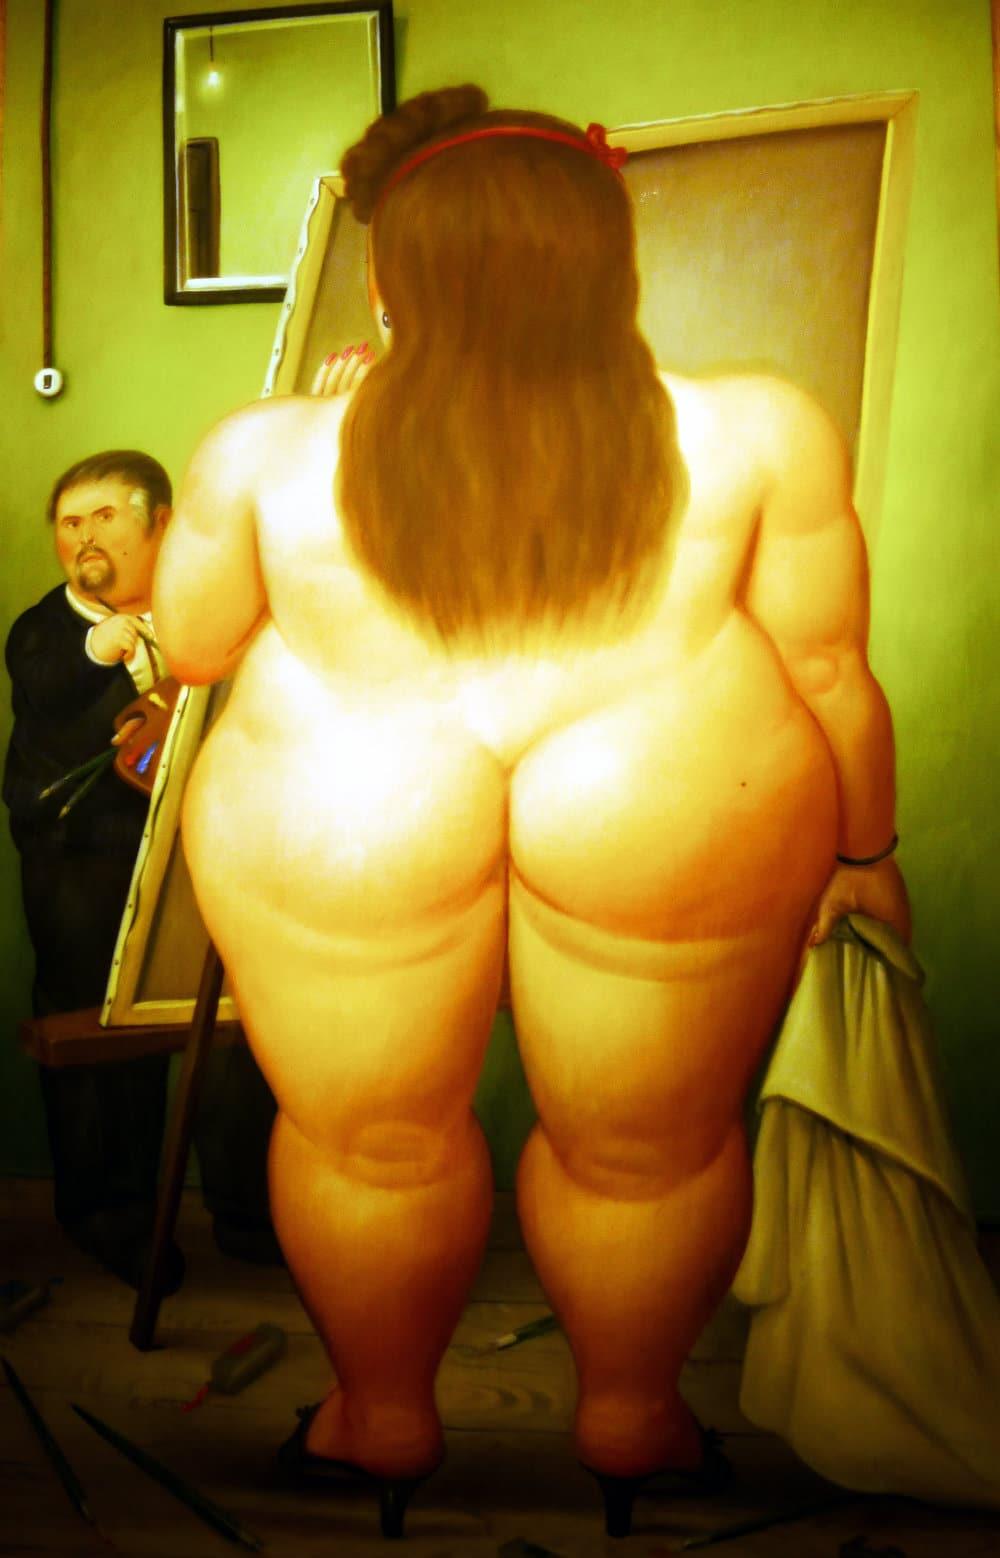 Erotismo y voluptousidad en la obra de Botero